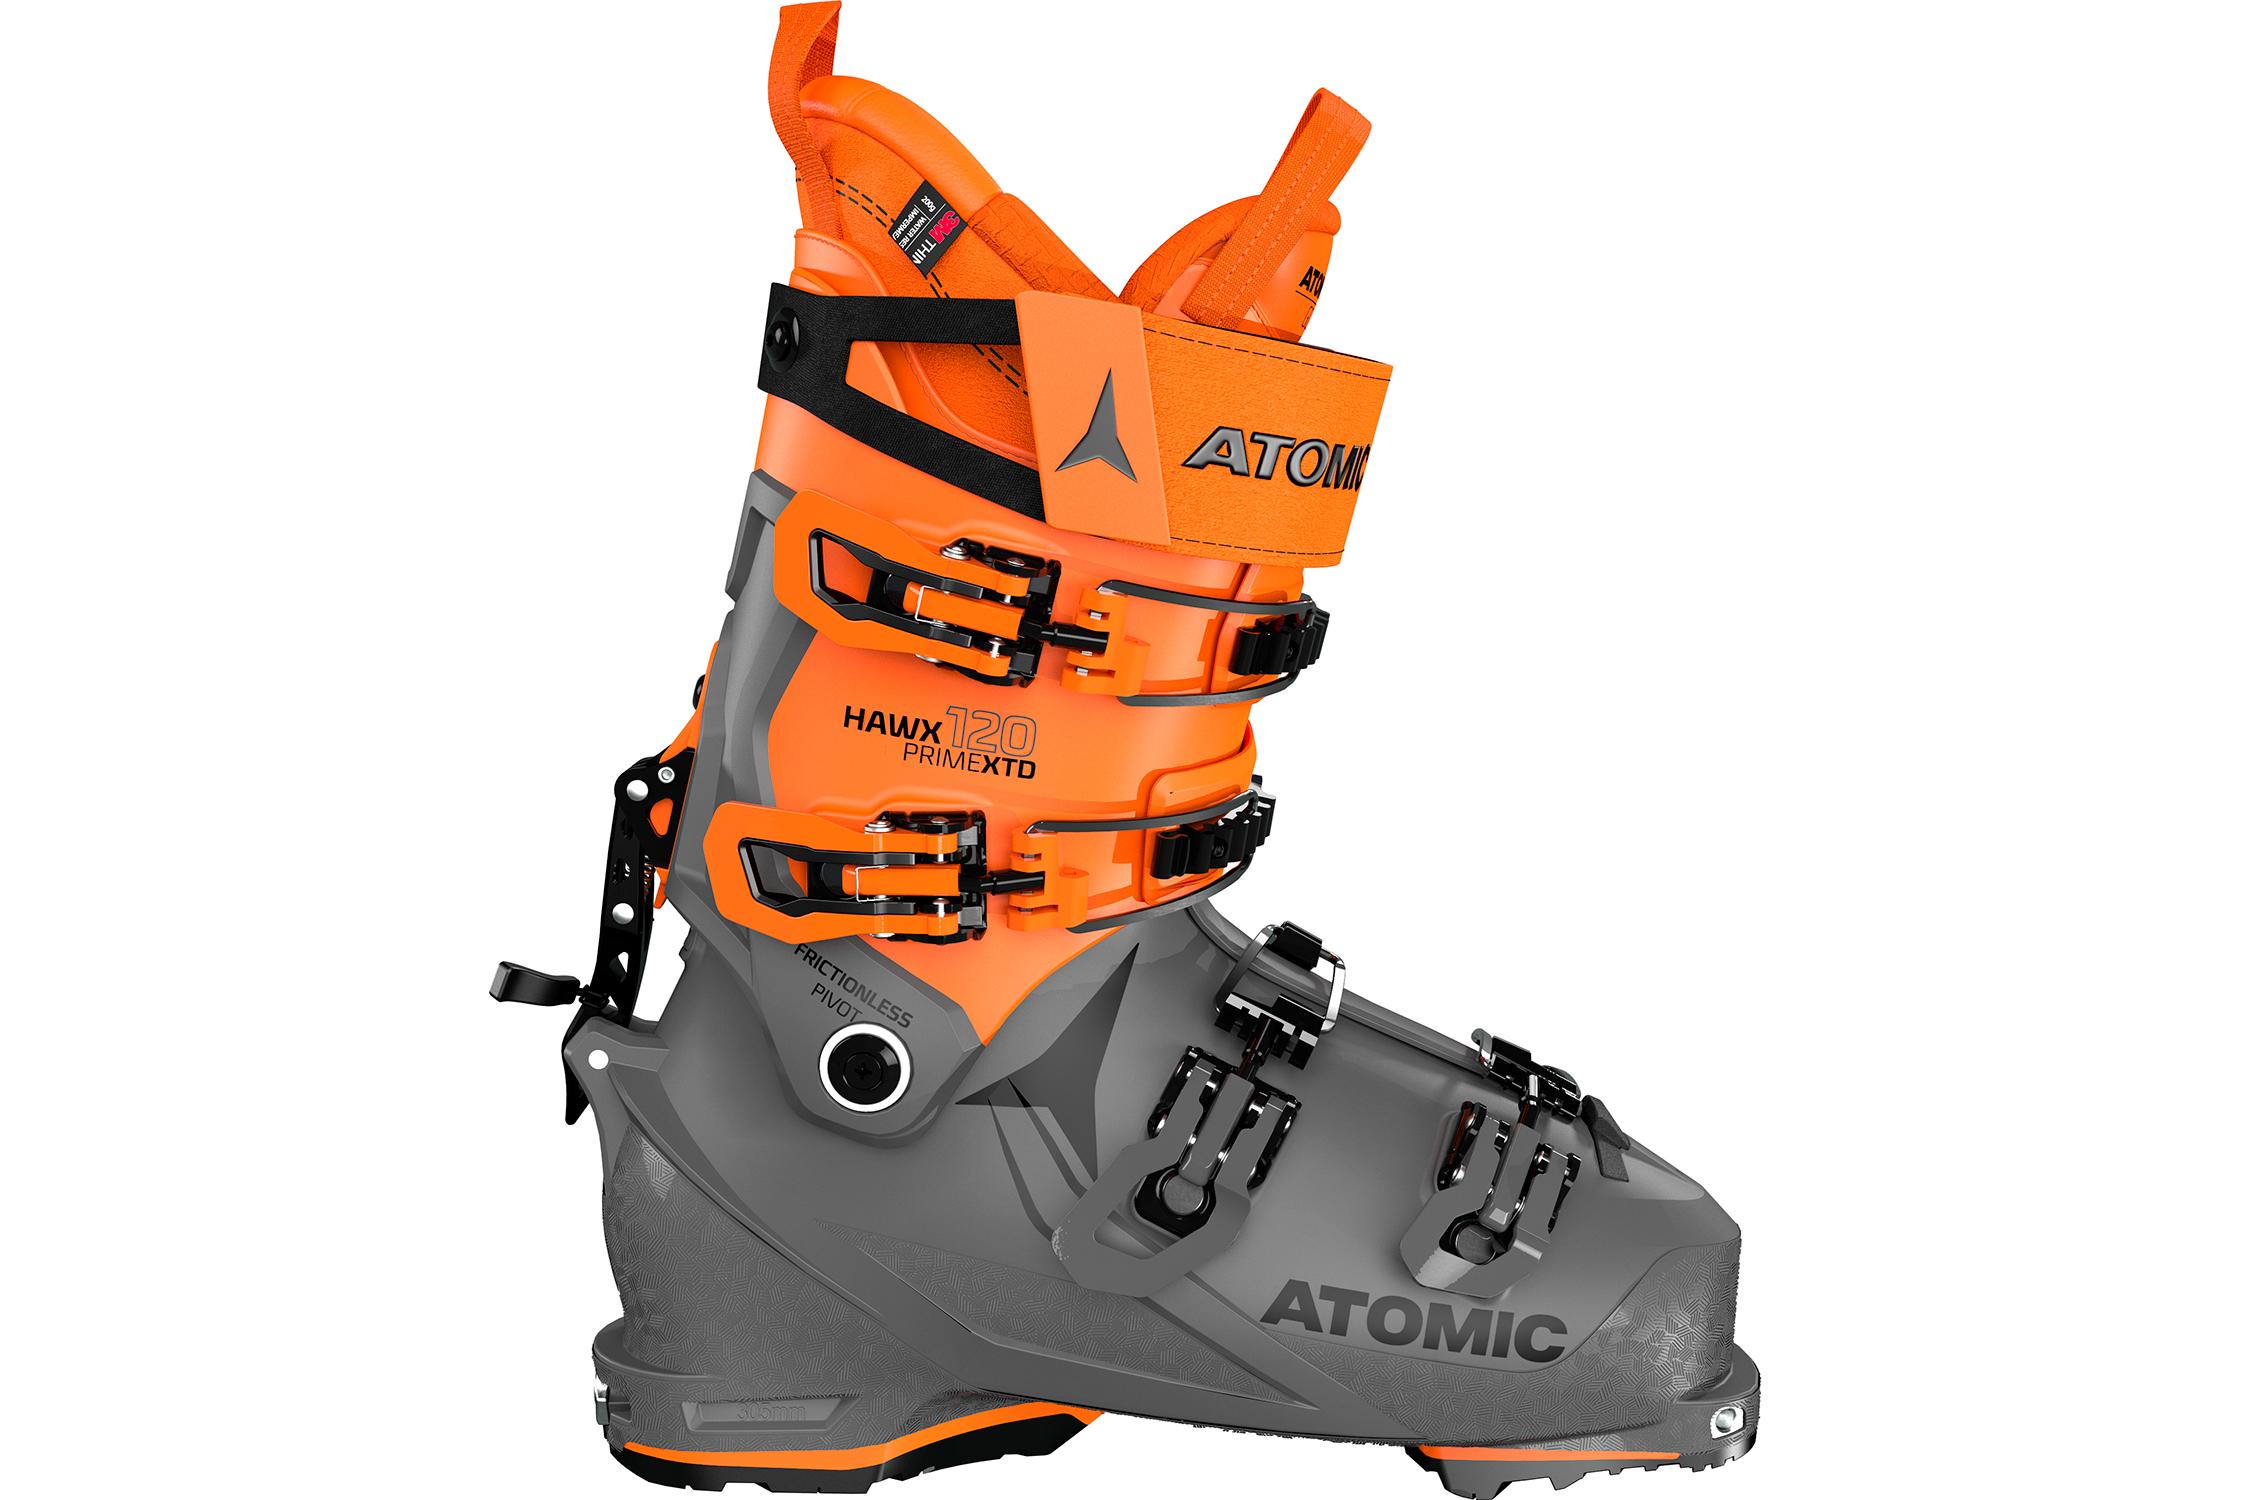 Atomic Hawx Prime XTD ski boot